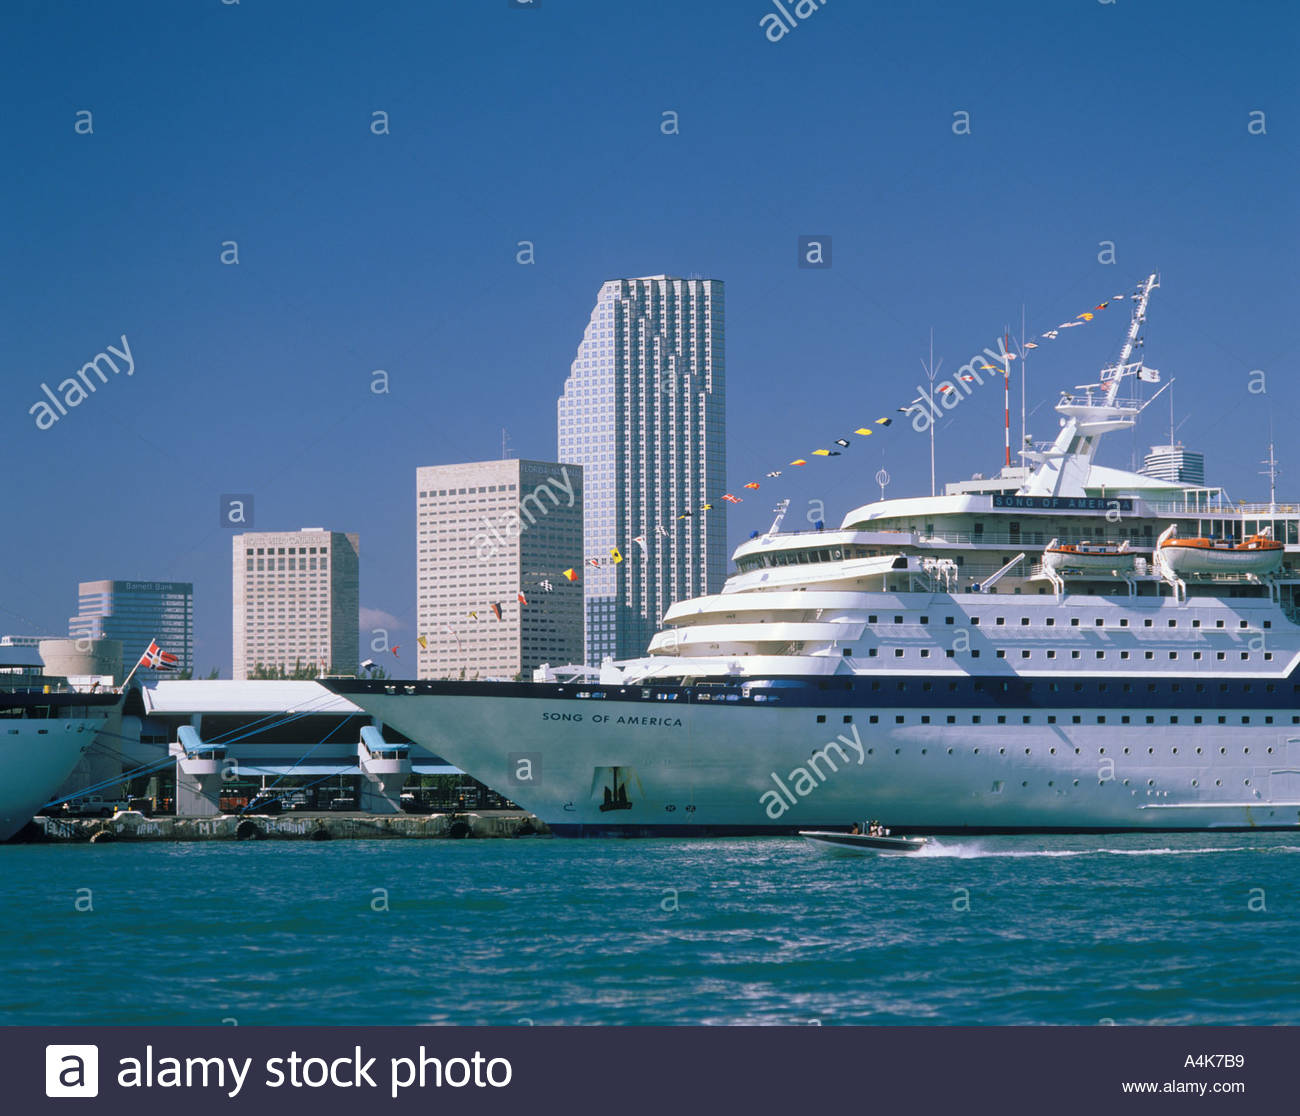 Cruise Ship Port Miami: Song Of Amarica In Cruise Port Miami Florida USA Stock